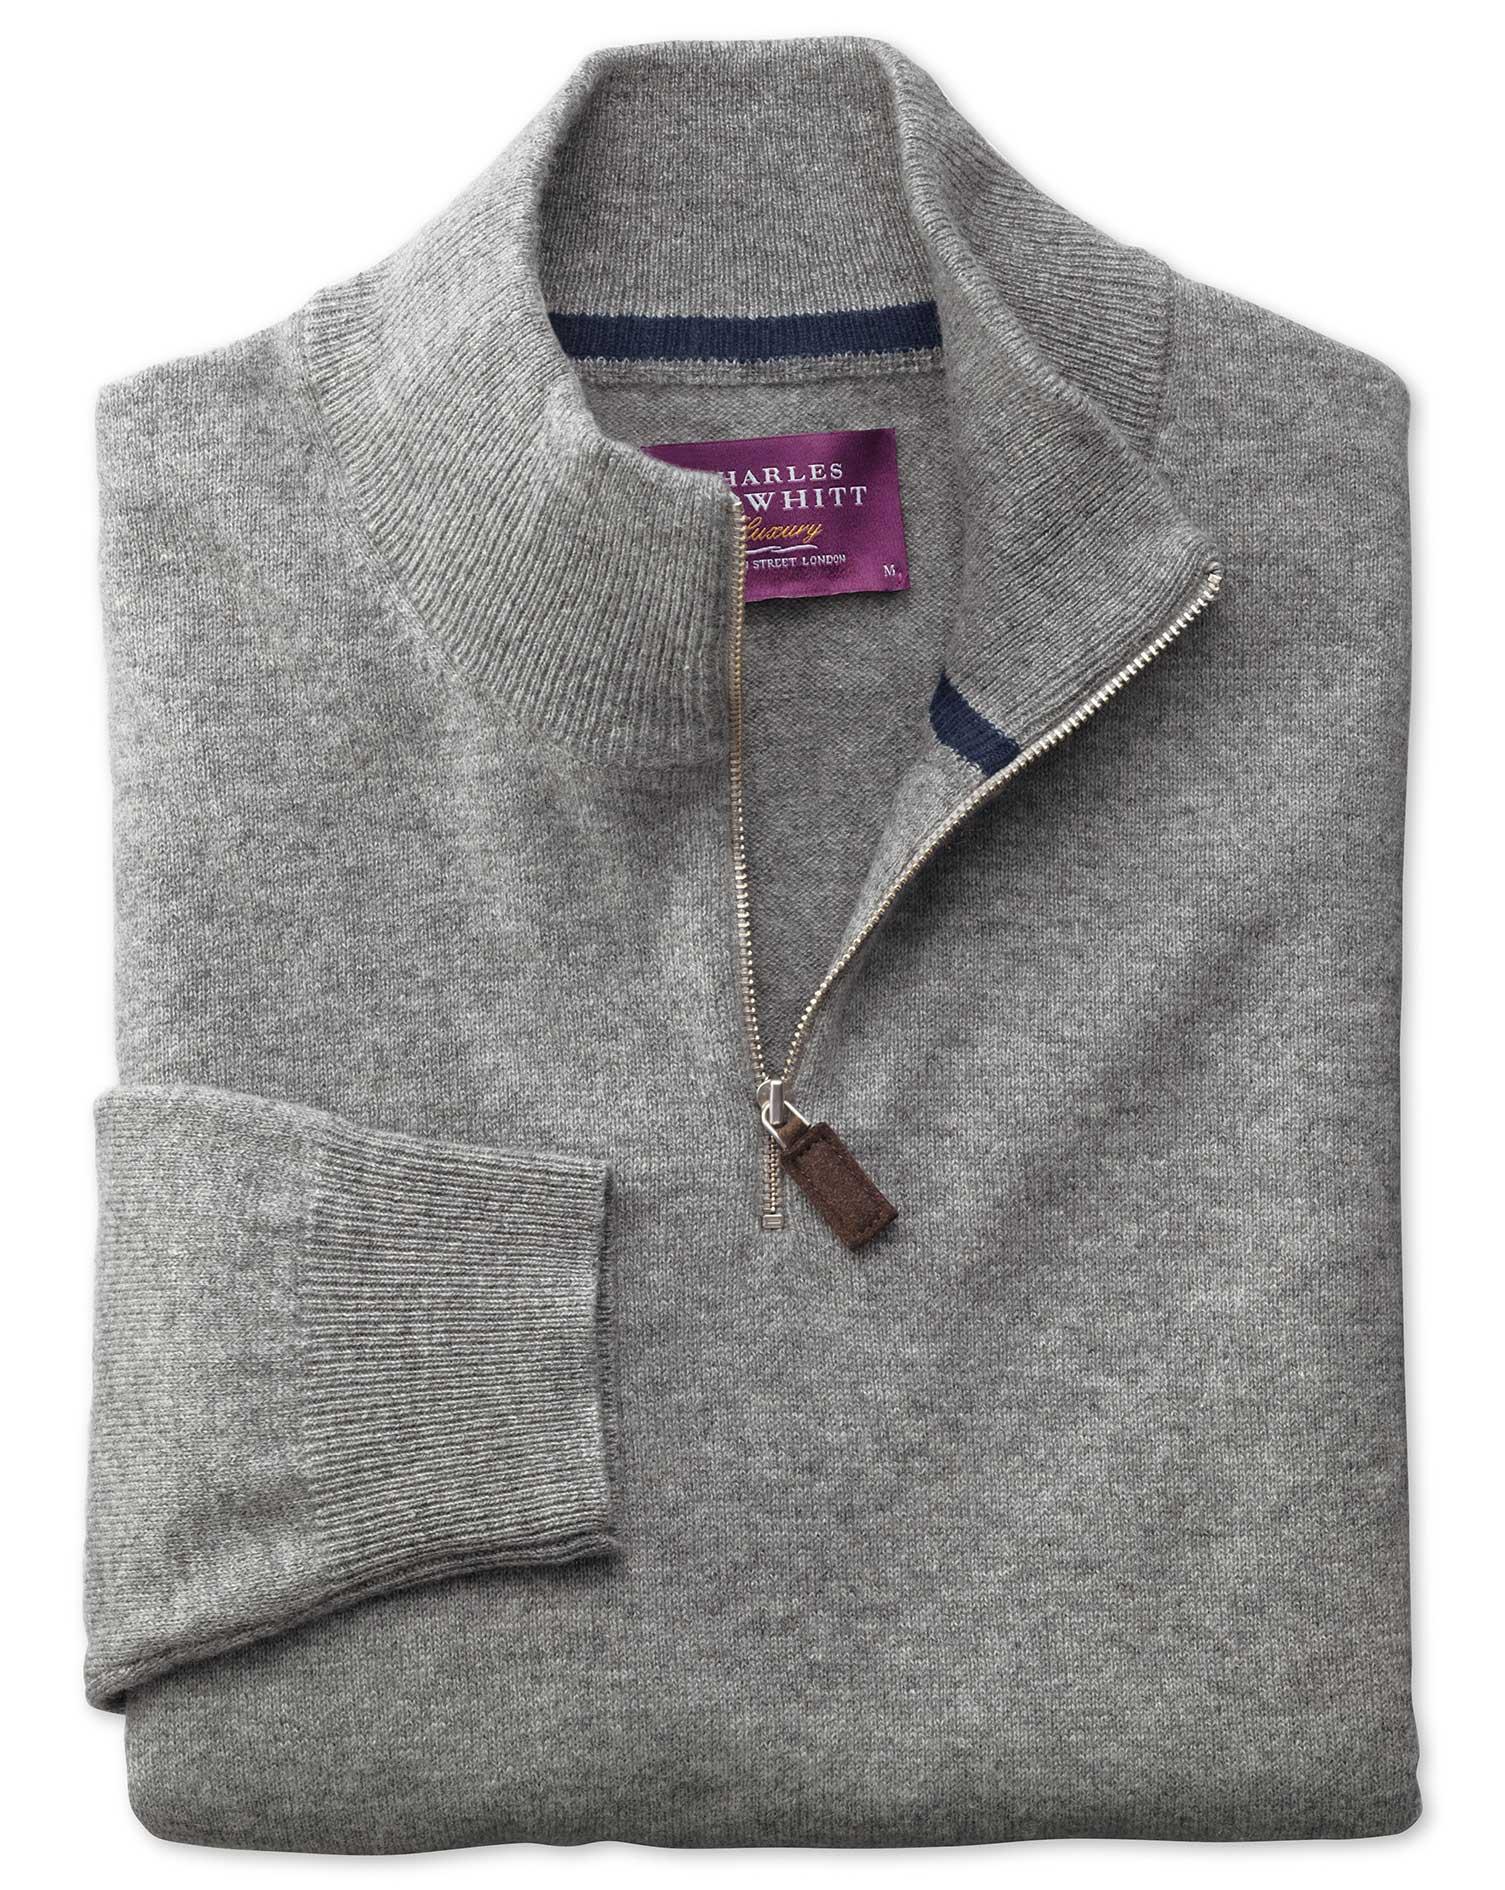 Silver Cashmere Zip Neck Jumper Size XL by Charles Tyrwhitt